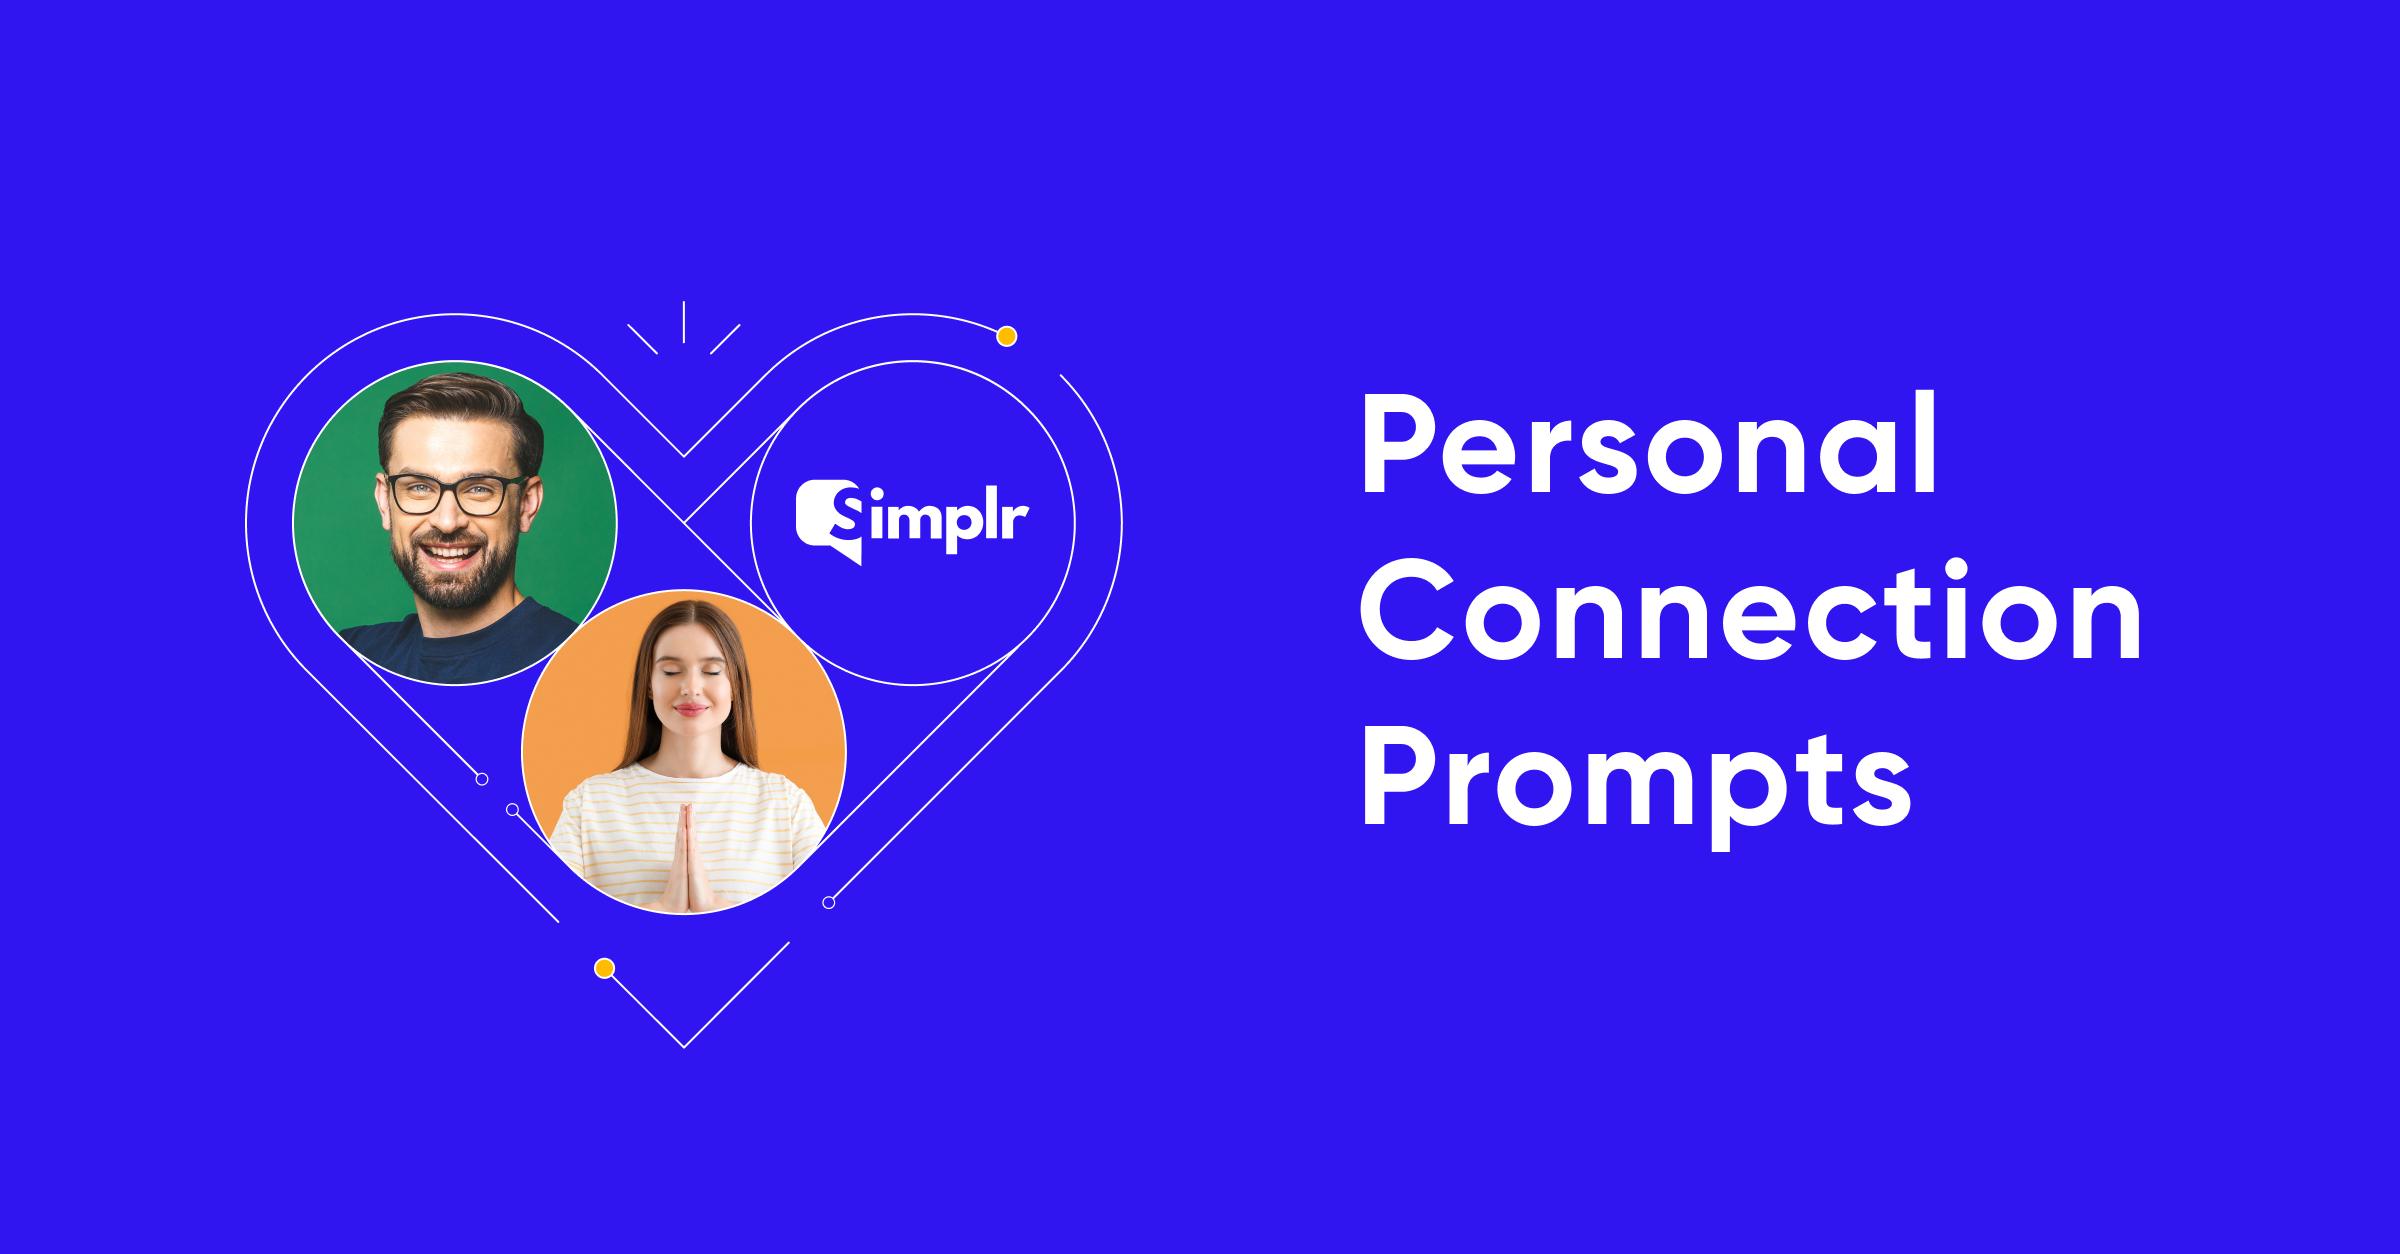 Q321_30_personal-connection-prompts-lp_blog-social-preview